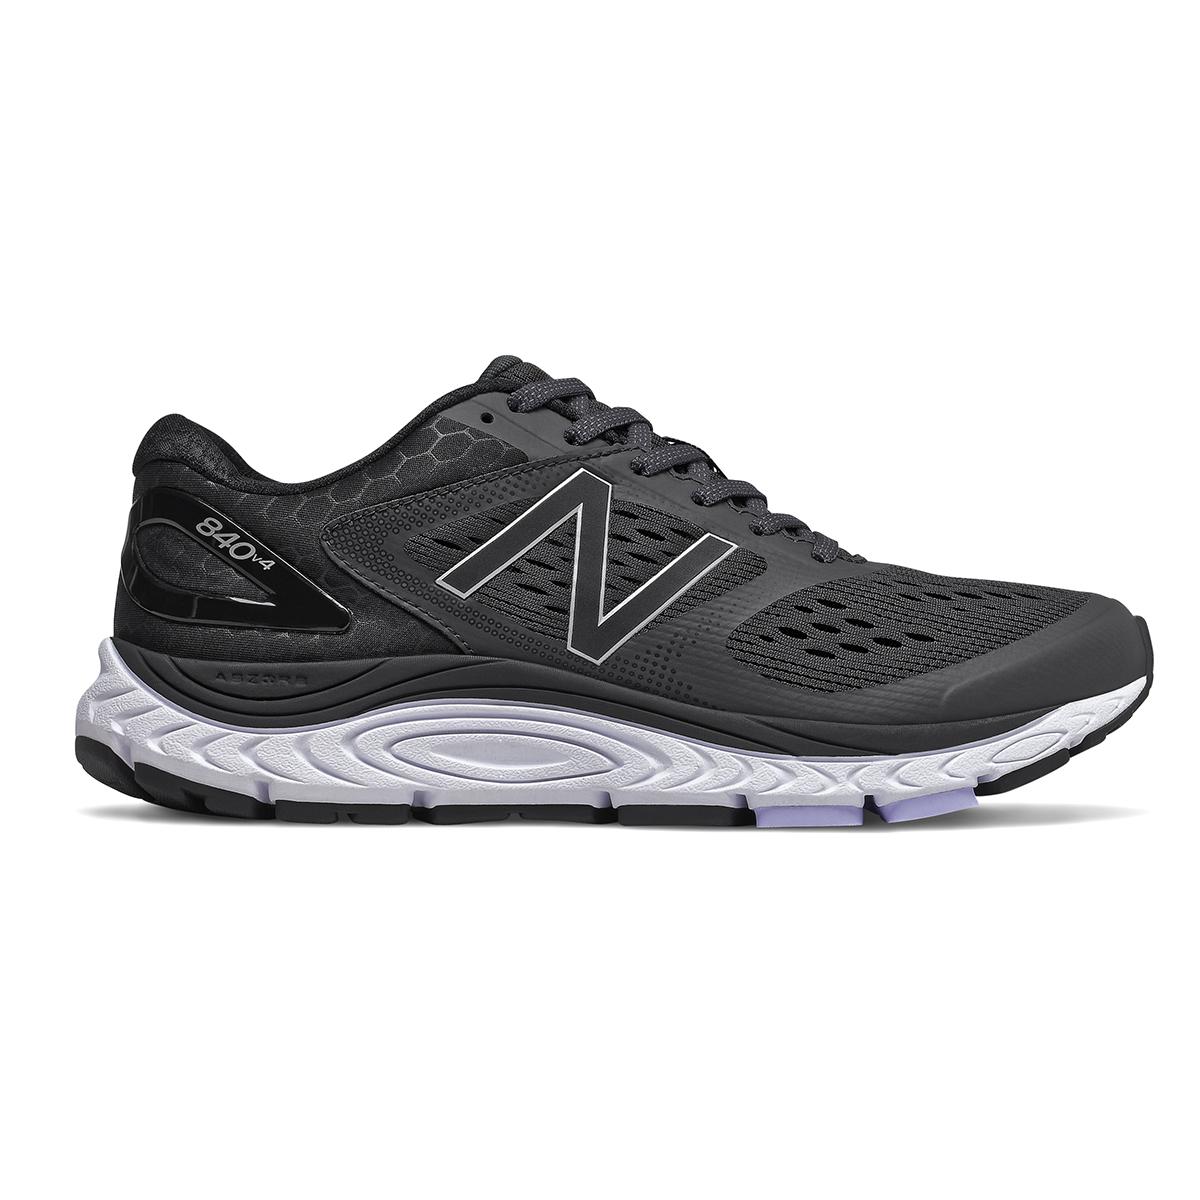 Women's New Balance 840V4 Walking Shoe - Color: Black - Size: 5 - Width: Narrow, Black, large, image 1